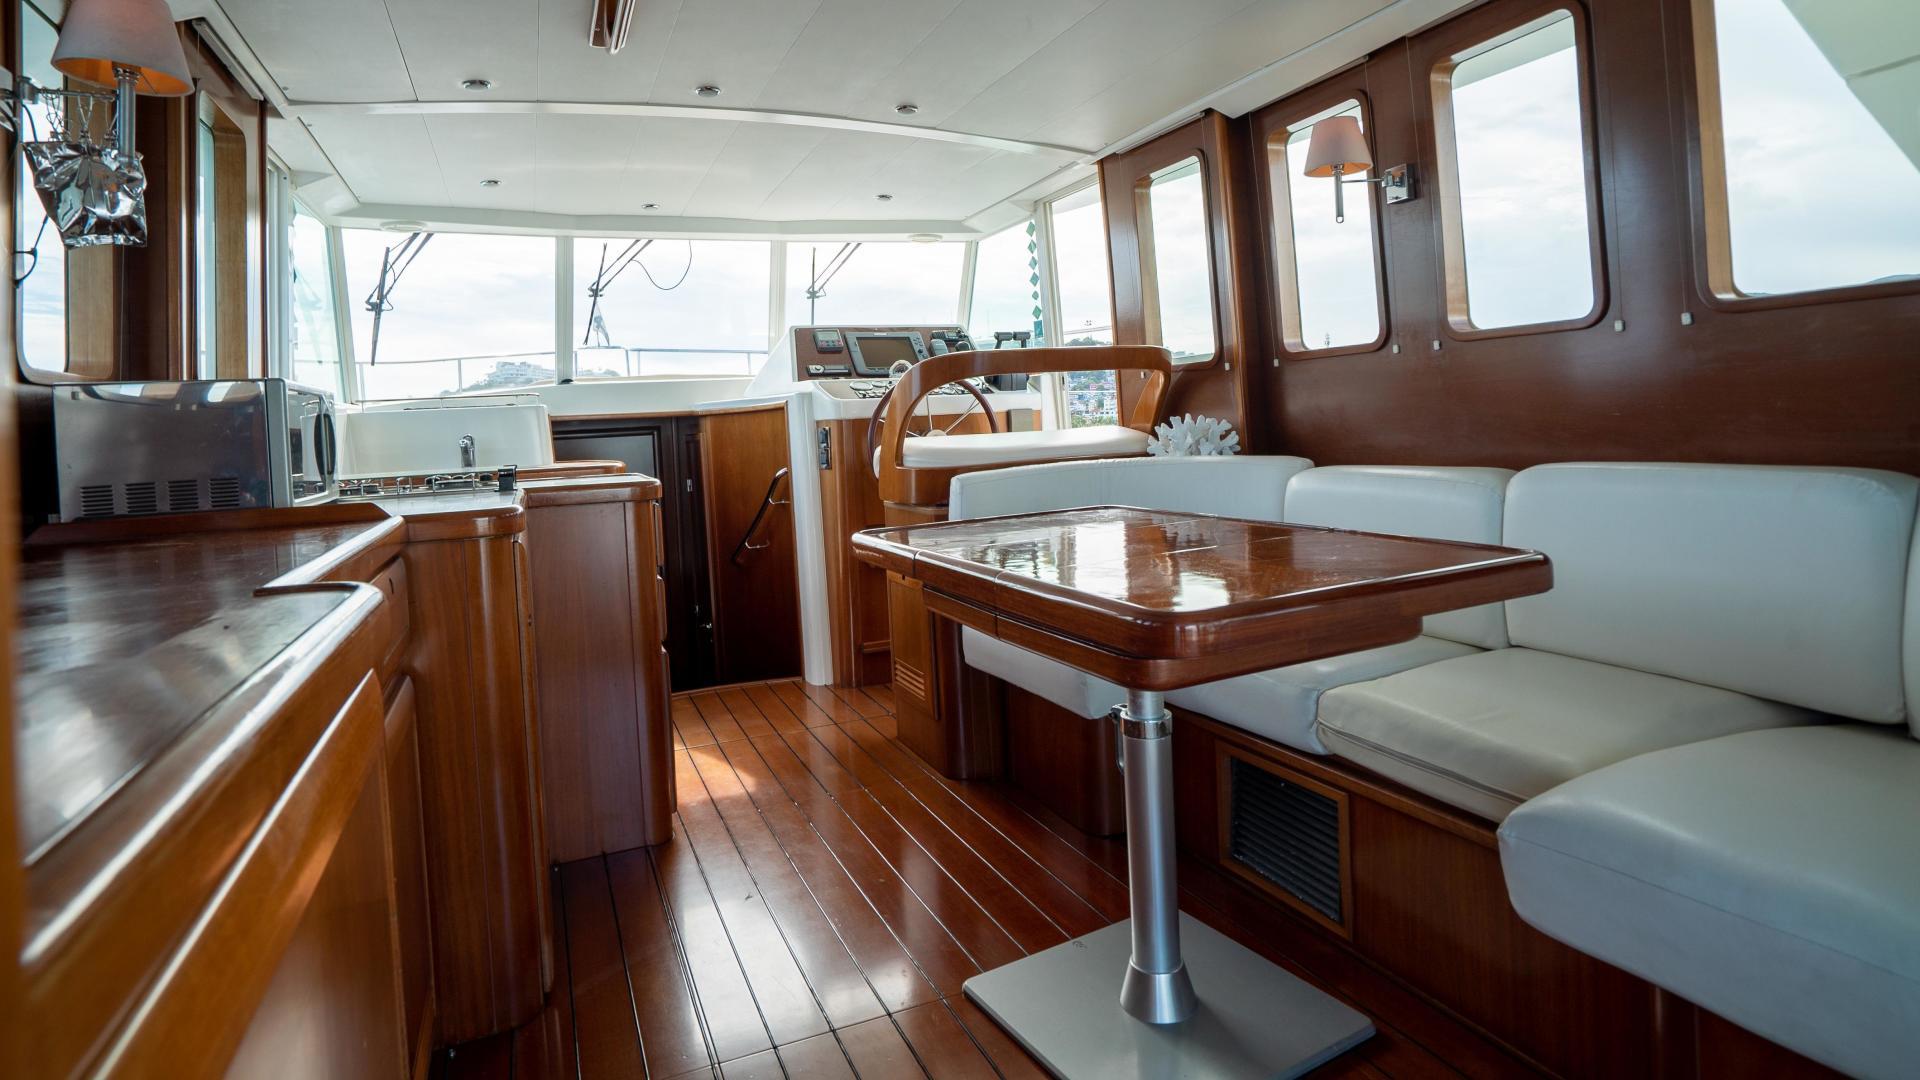 Beneteau-Swift Trawler 2008-Amadeus Acapulco-Mexico-1487059 | Thumbnail